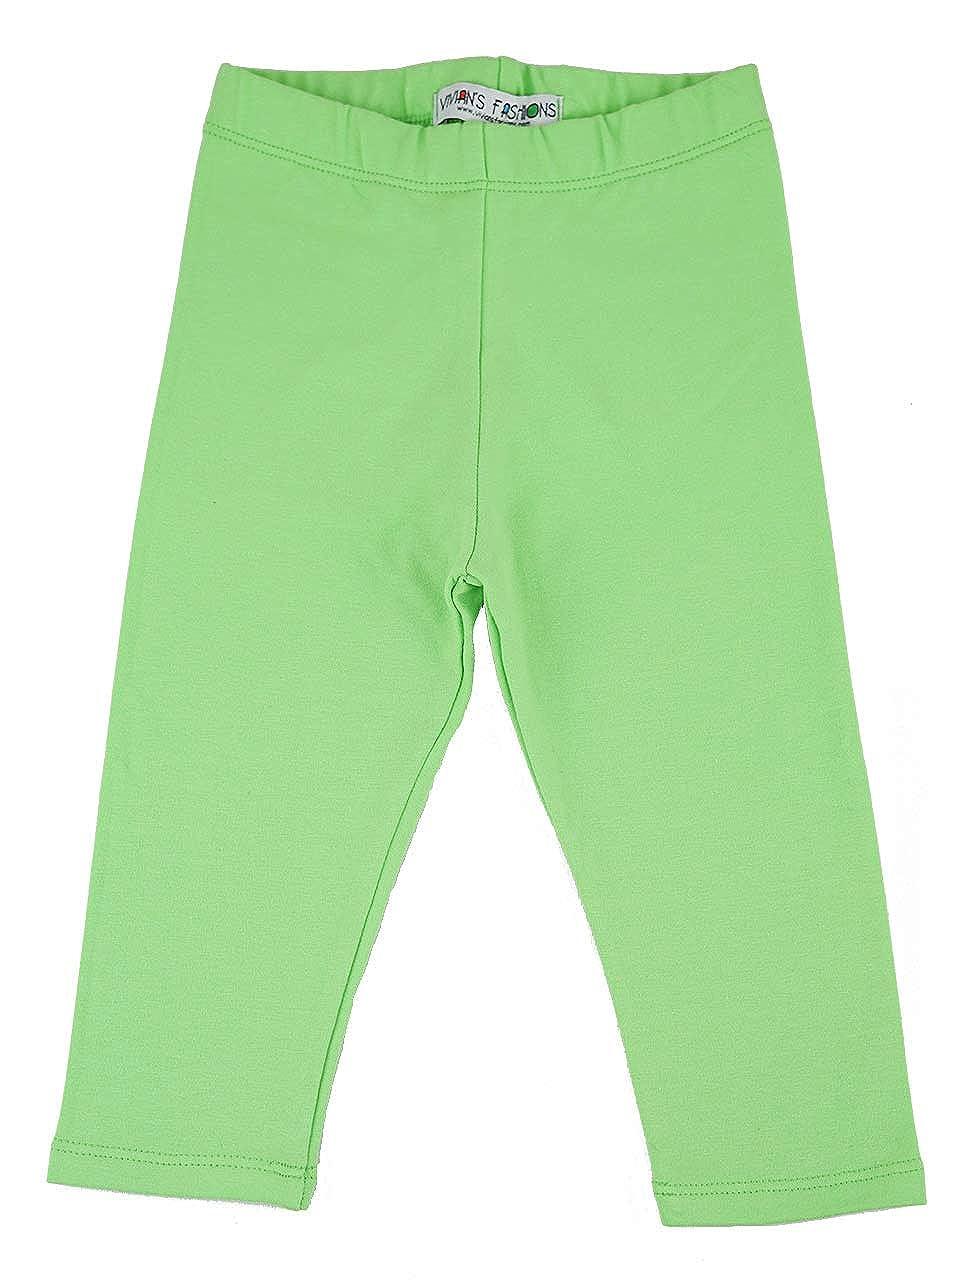 Bulk Vivians Fashions Capri Leggings 6 Pack Cotton Baby Girls